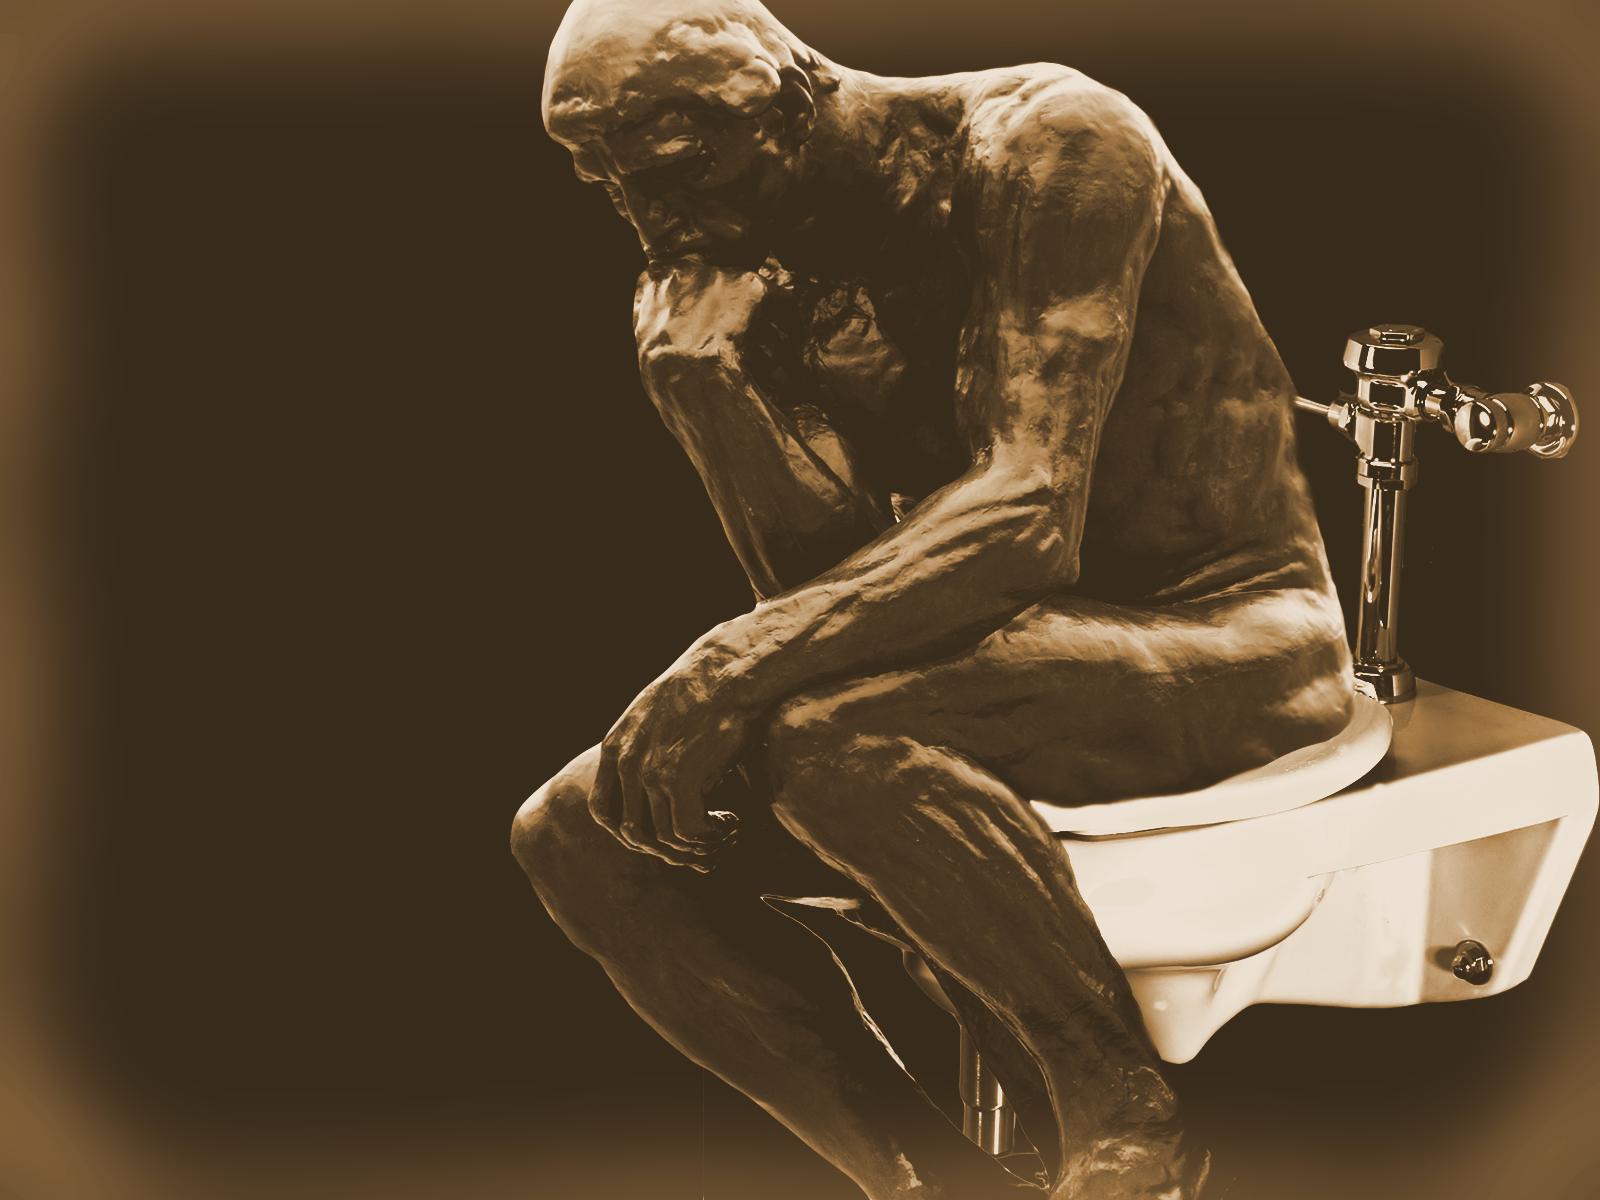 The Thinker On The John by MrAngryDog